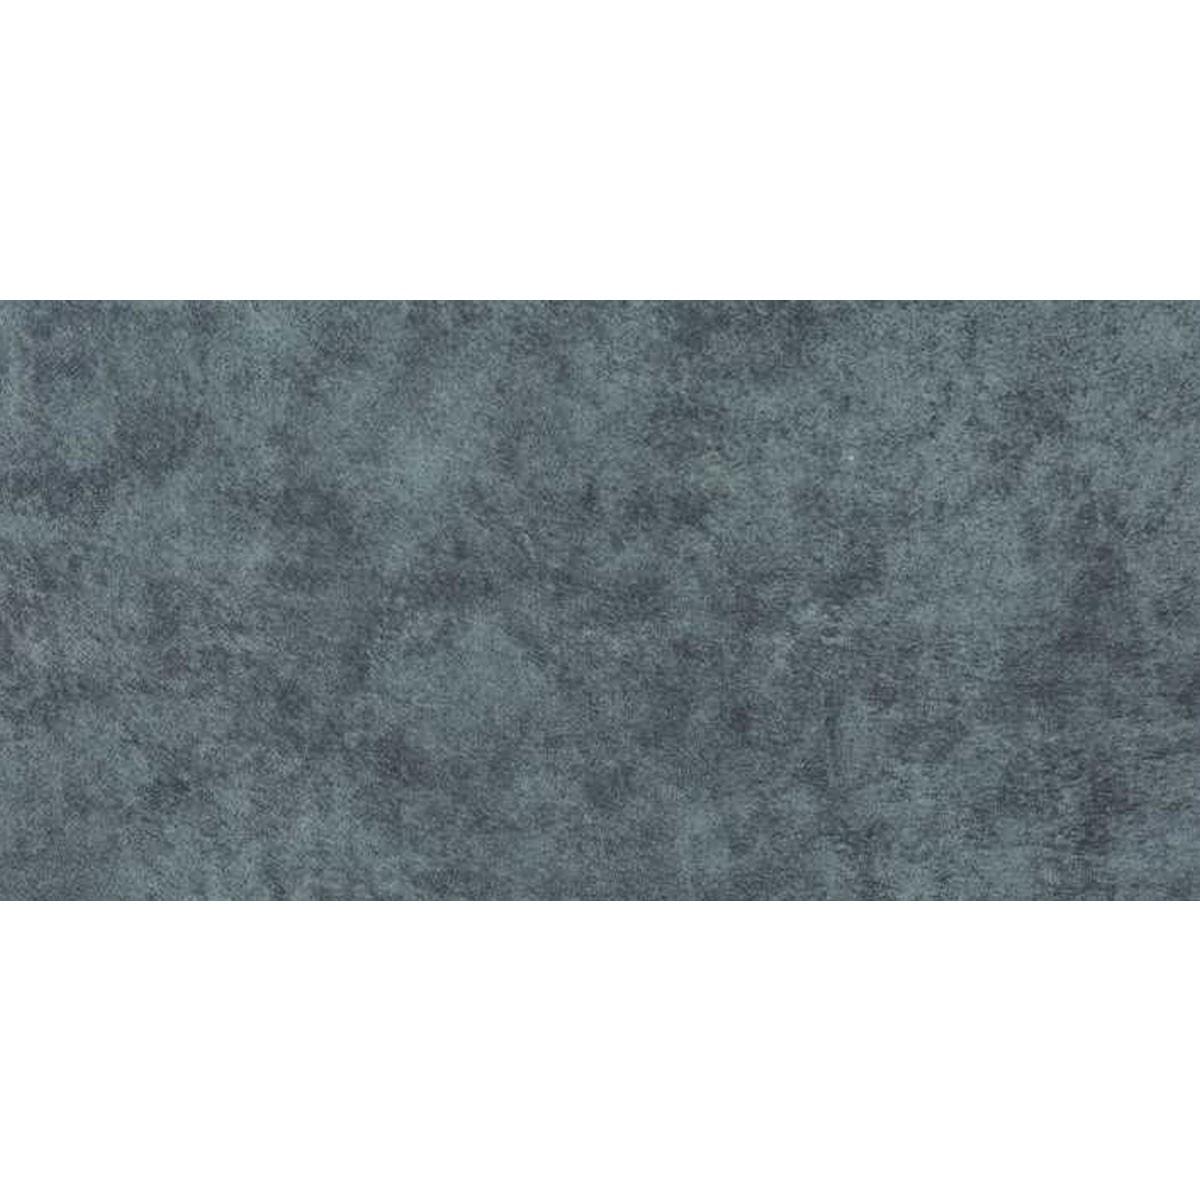 24 x 12 In. Brown Porcelain Floor Tile - 8 Pcs/Case (15.50 sq.ft/Case) (GN60E)